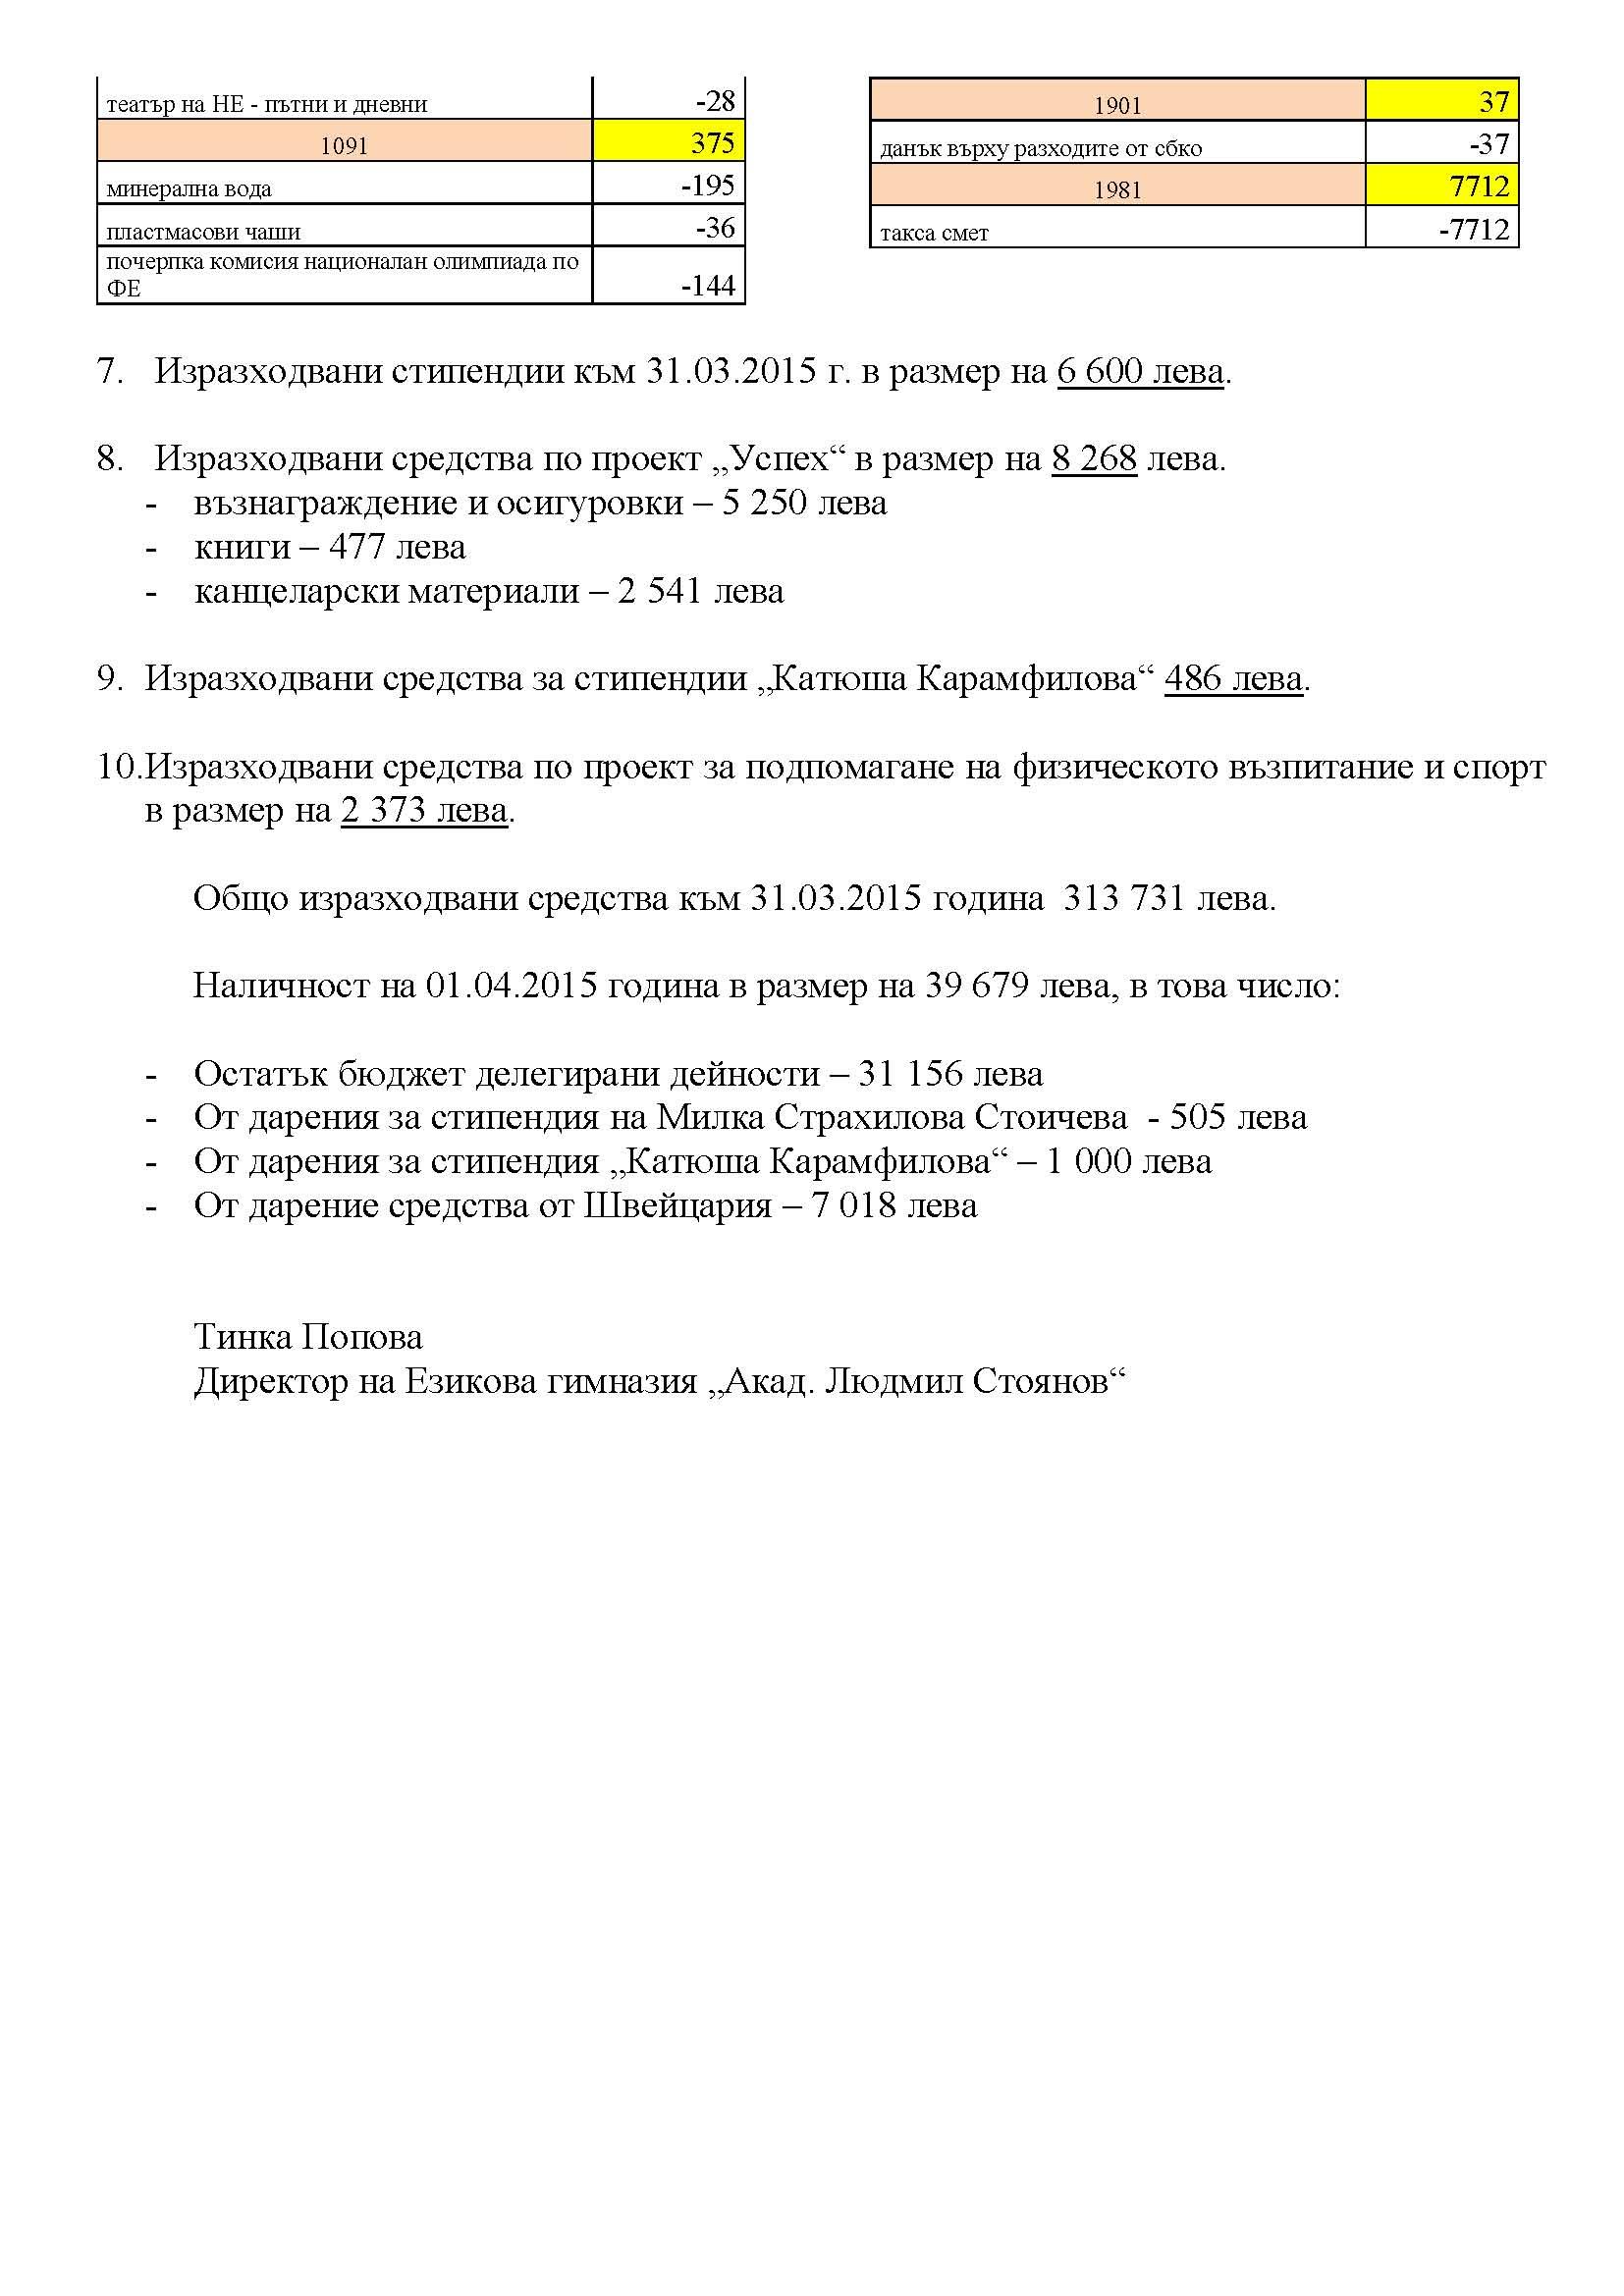 informaziq ot4et m. 03.2015 Page 3